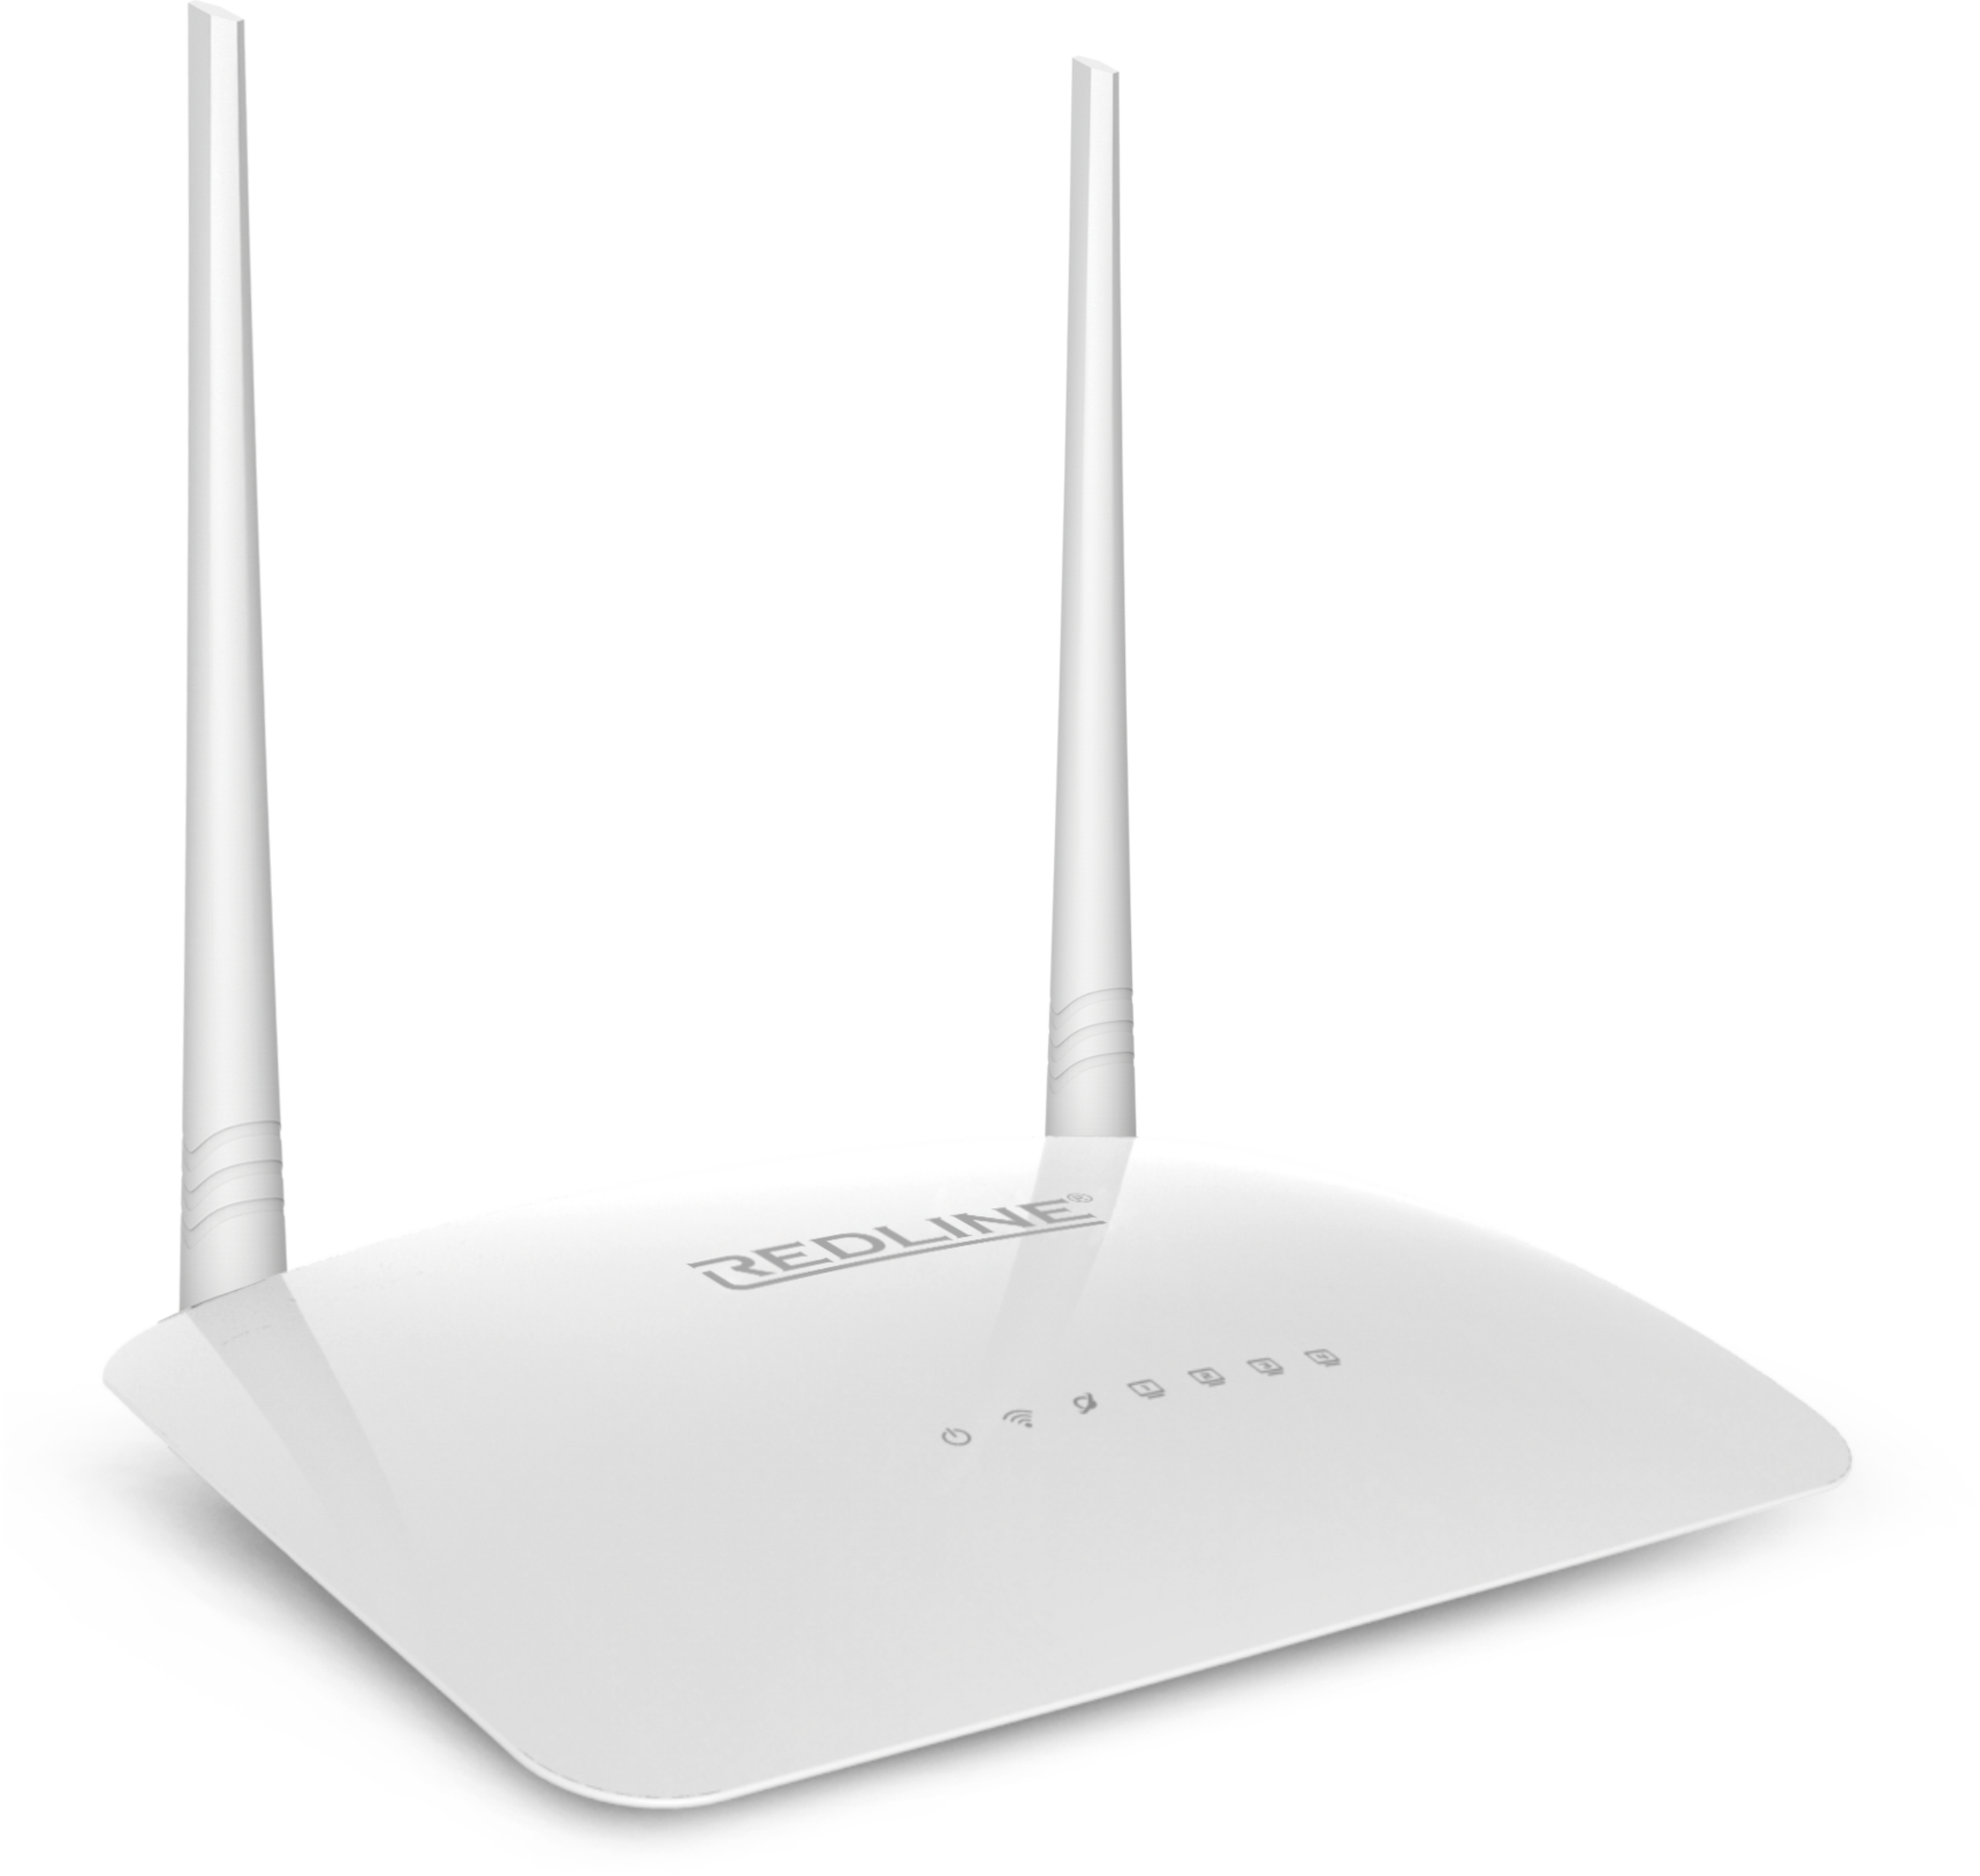 RL-WR1220 REDLINE RL-WR1220 Kablosuz-N WPS + WISP+WDS 300 Mbps Repeater+Access Point+Bridge Kablosuz Router